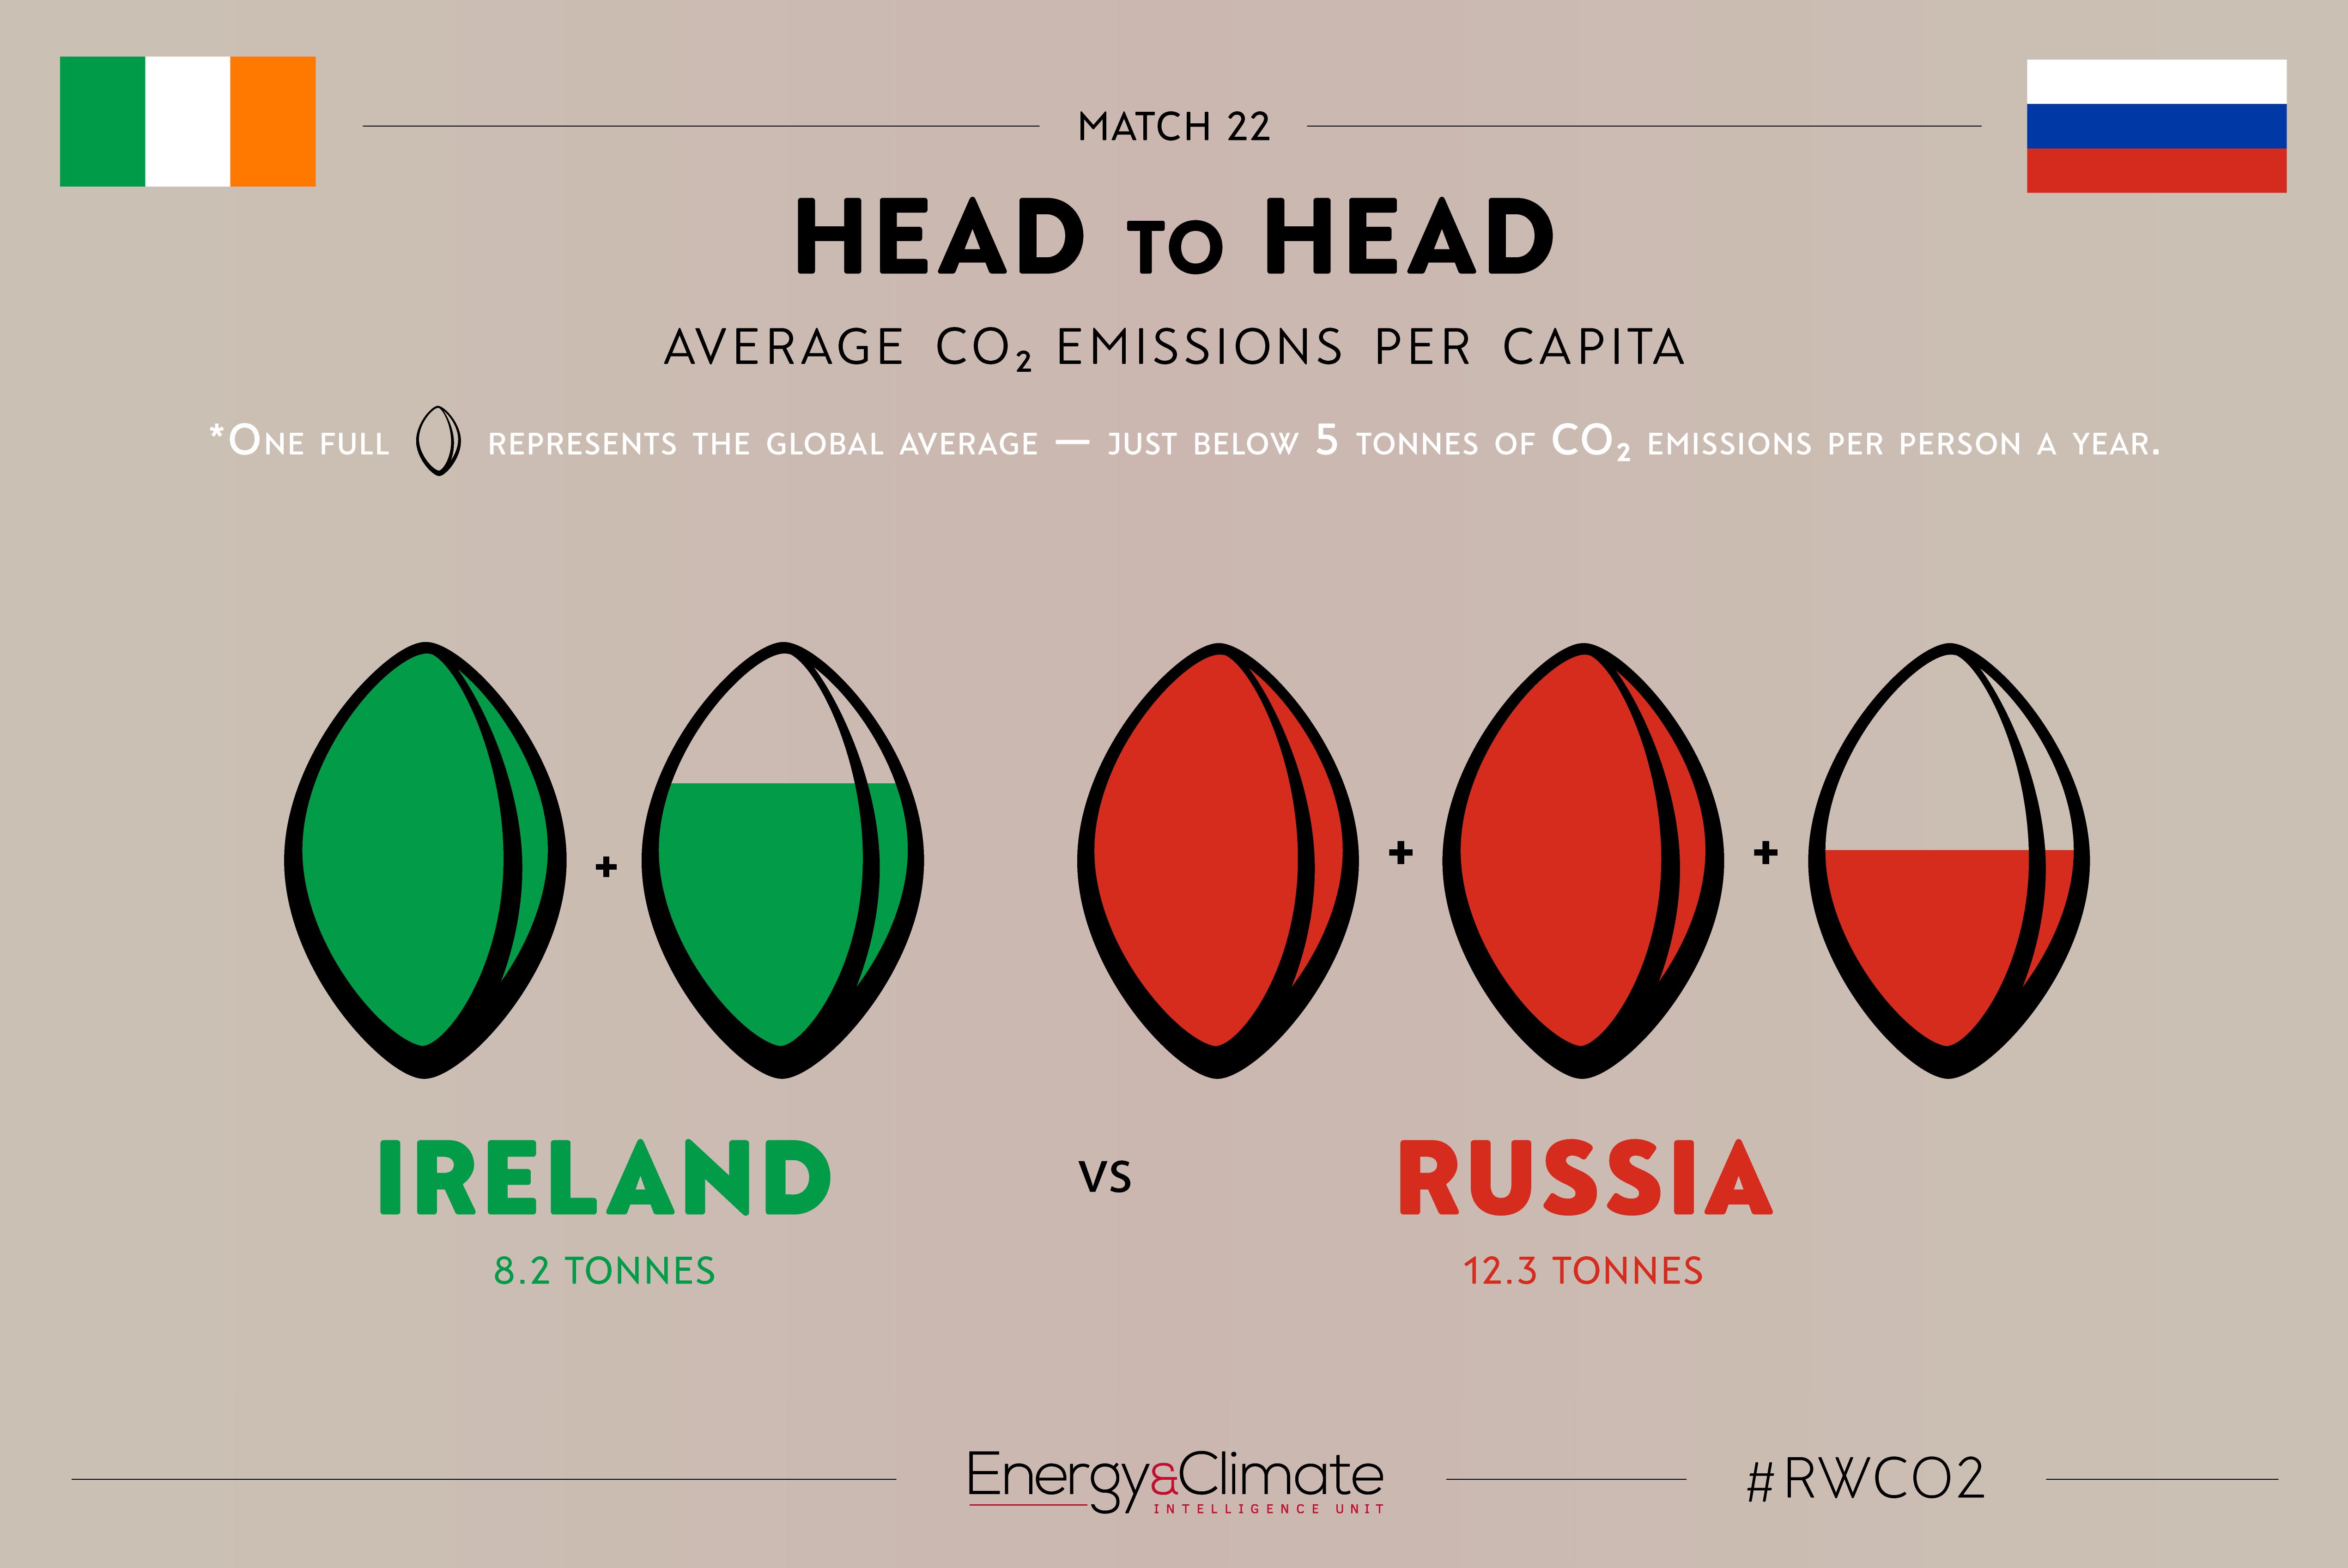 Ireland v Russia per capita emissions